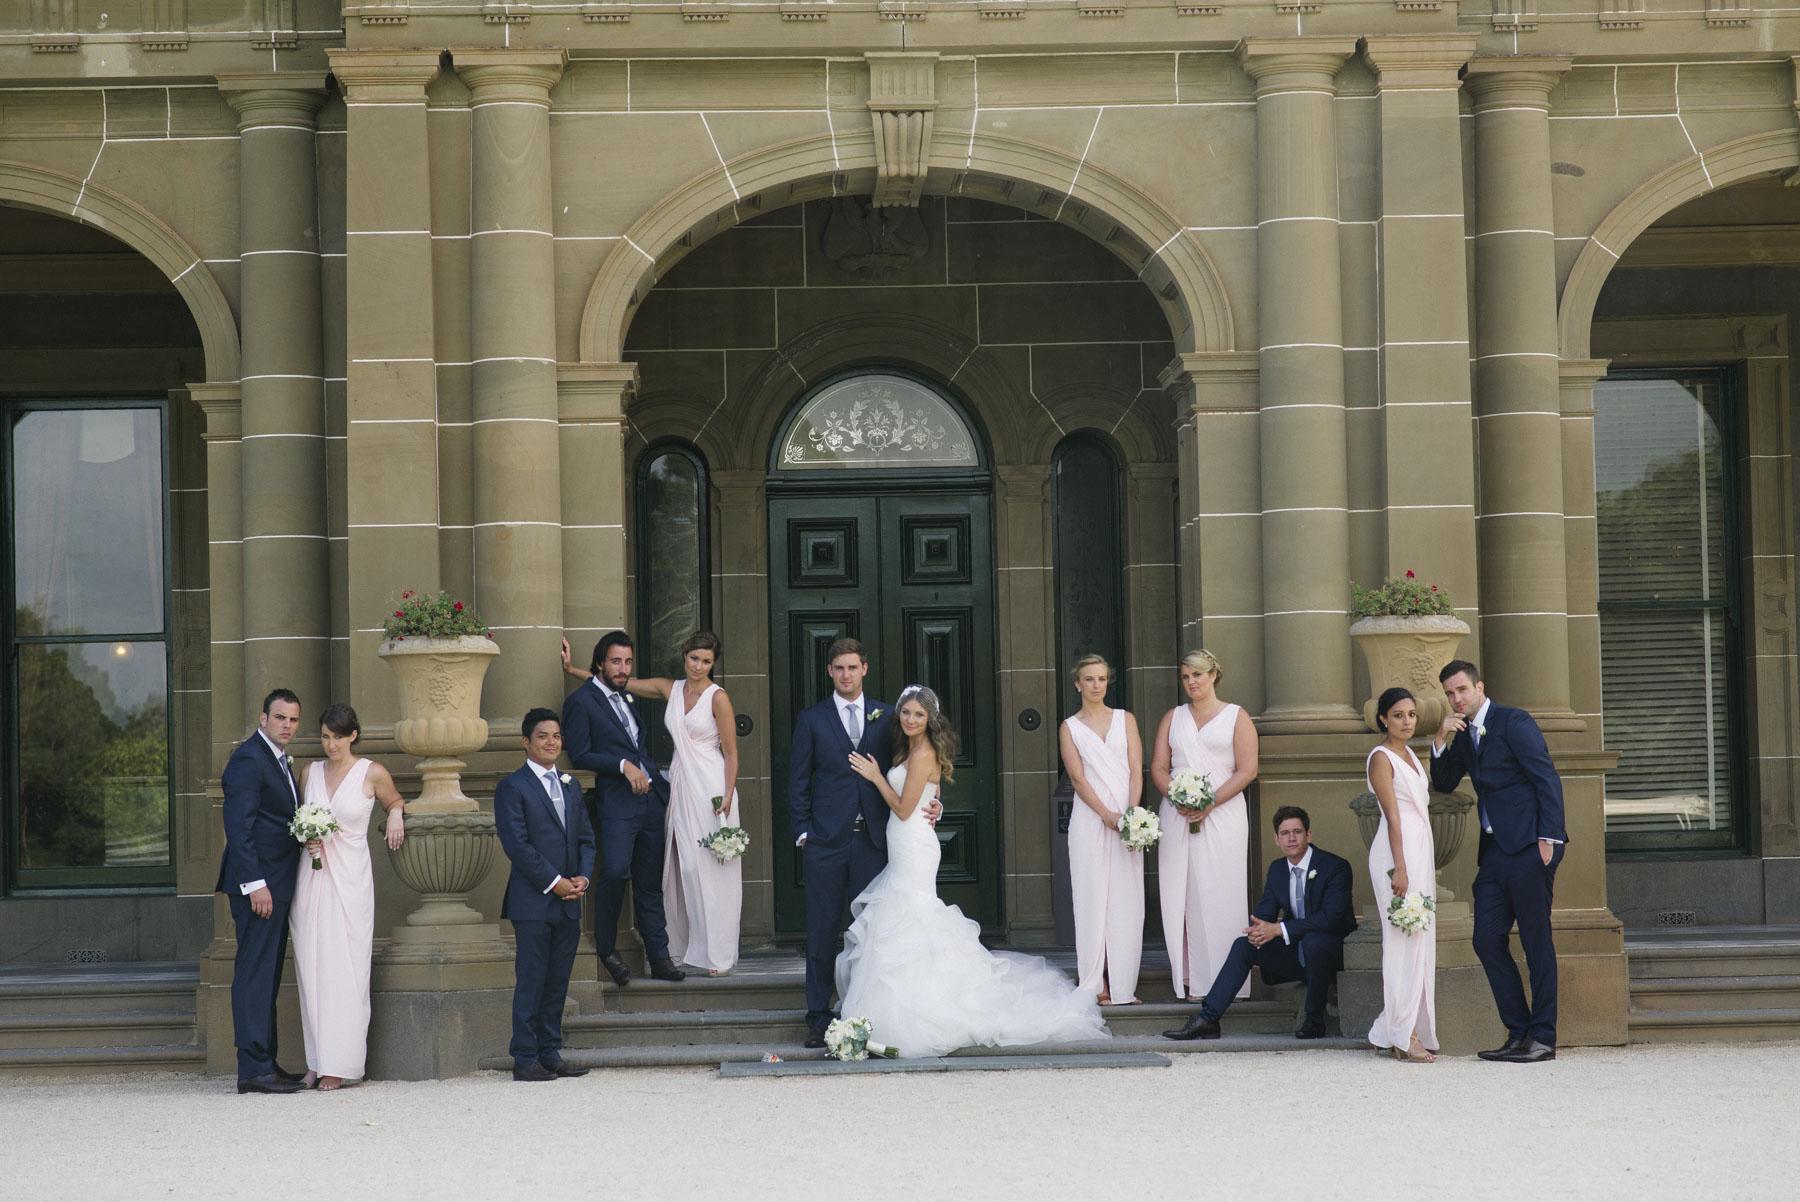 1501vand-261alan_moyle_wedding_portrait_brighton_bayside_werribee_estate_mansion_zoo_rustic_styled_garden_mansion_candid_documentry_victoria_whitelaw.jpg